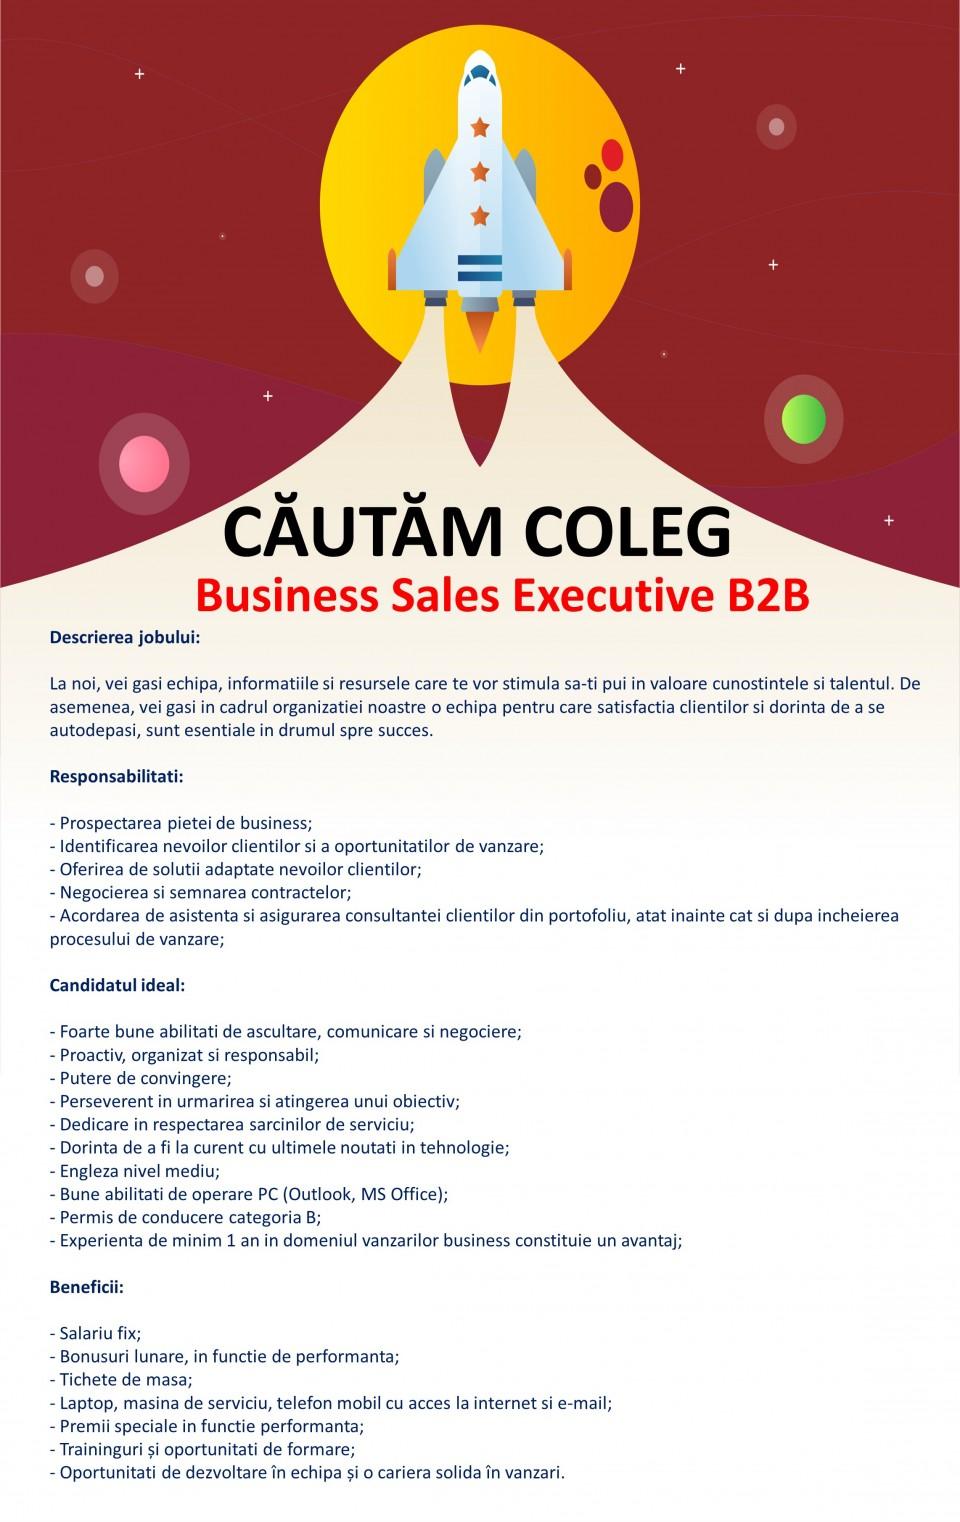 BUSINESS SALES EXECUTIVE B2B